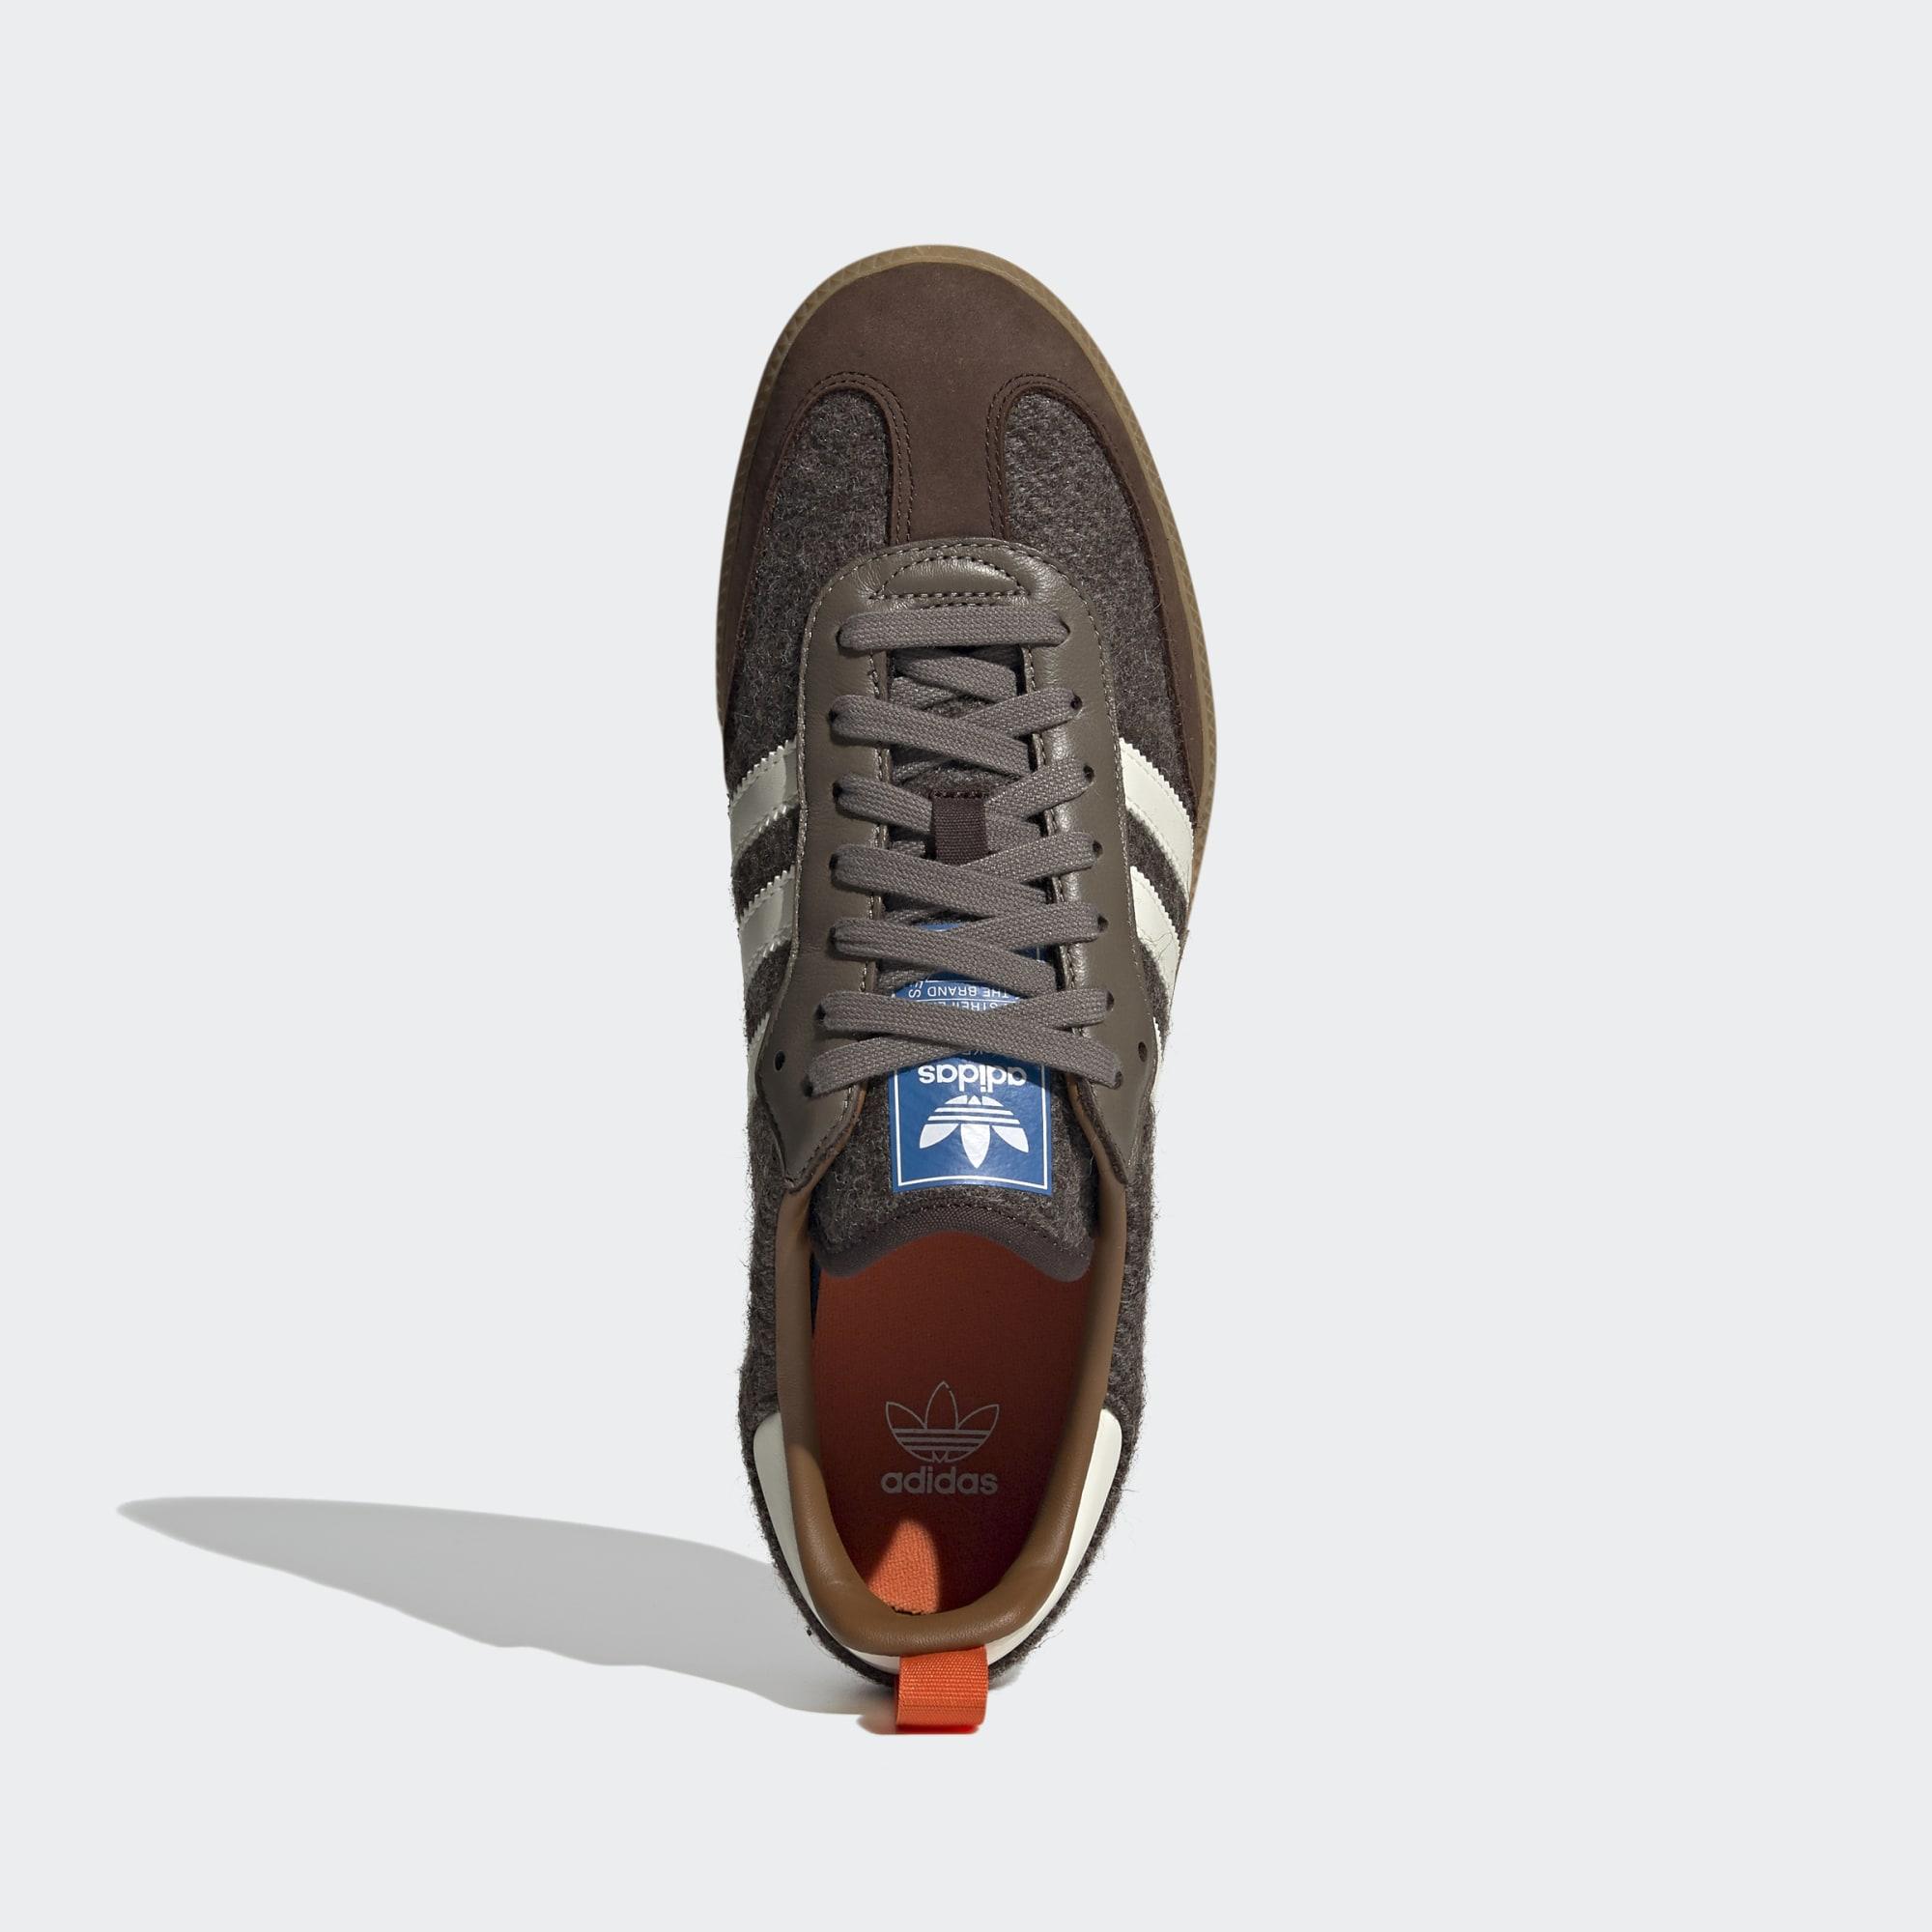 Samba_Fox_Shoes_Brown_H04942_02_standard_hover.jpg